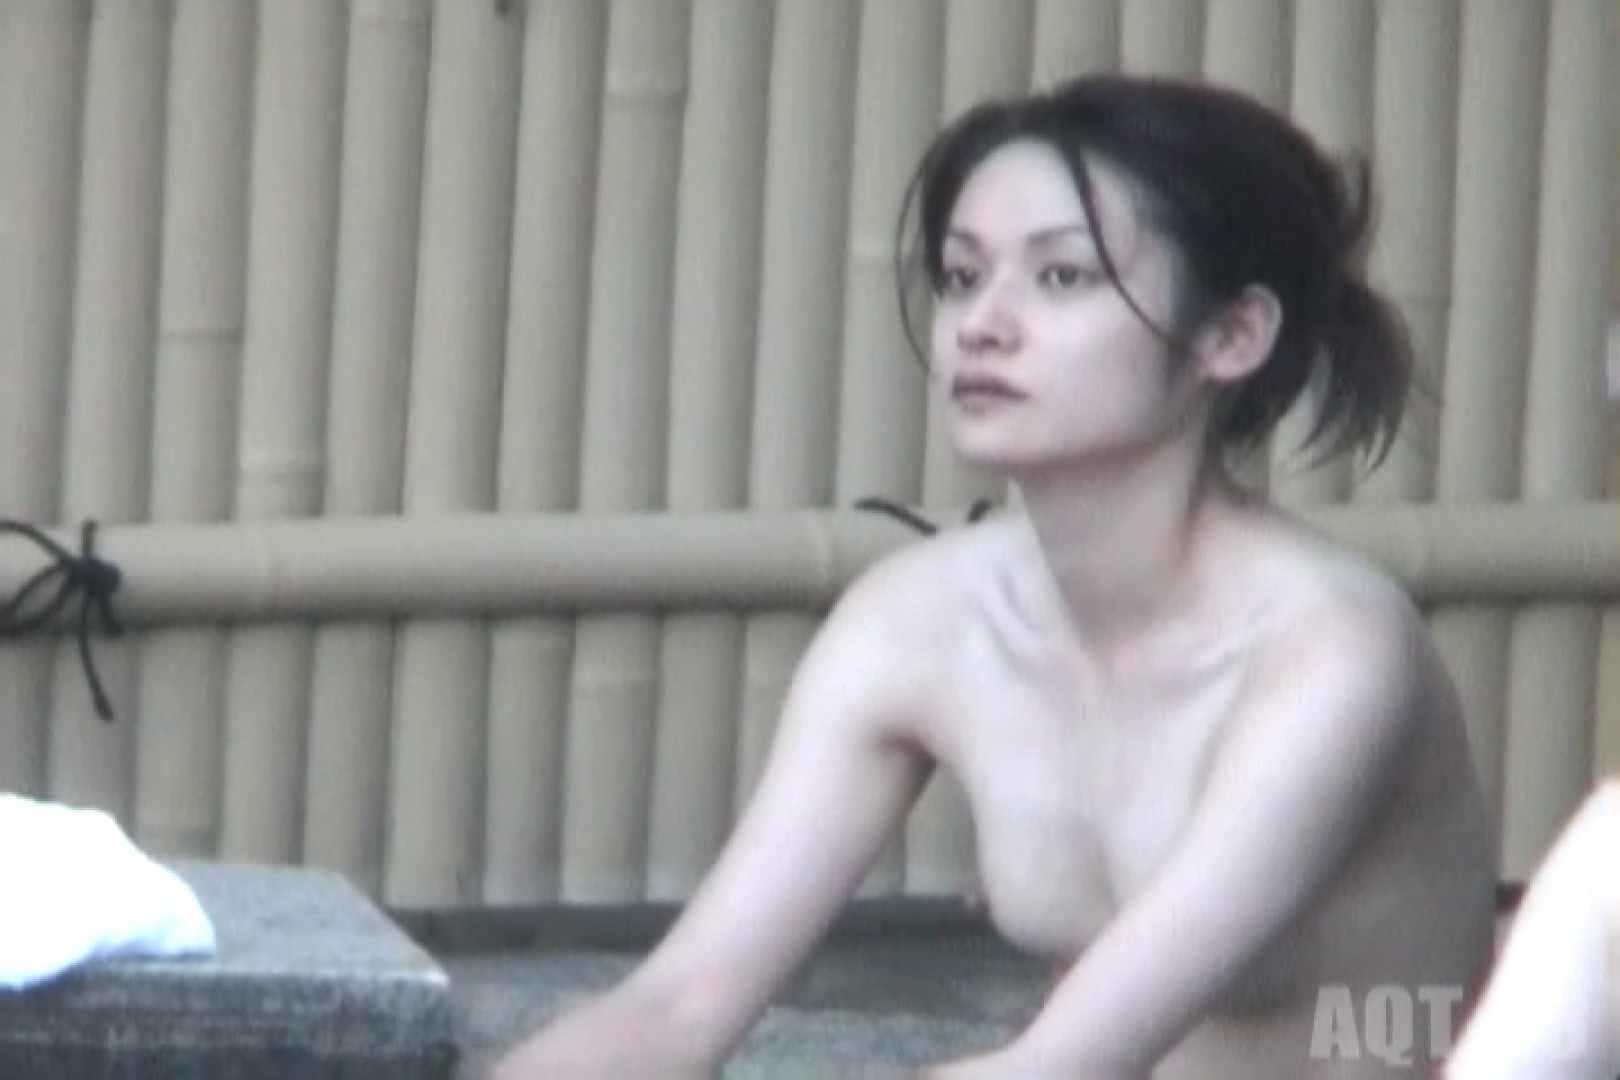 Aquaな露天風呂Vol.839 露天風呂突入 ワレメ動画紹介 96pic 77